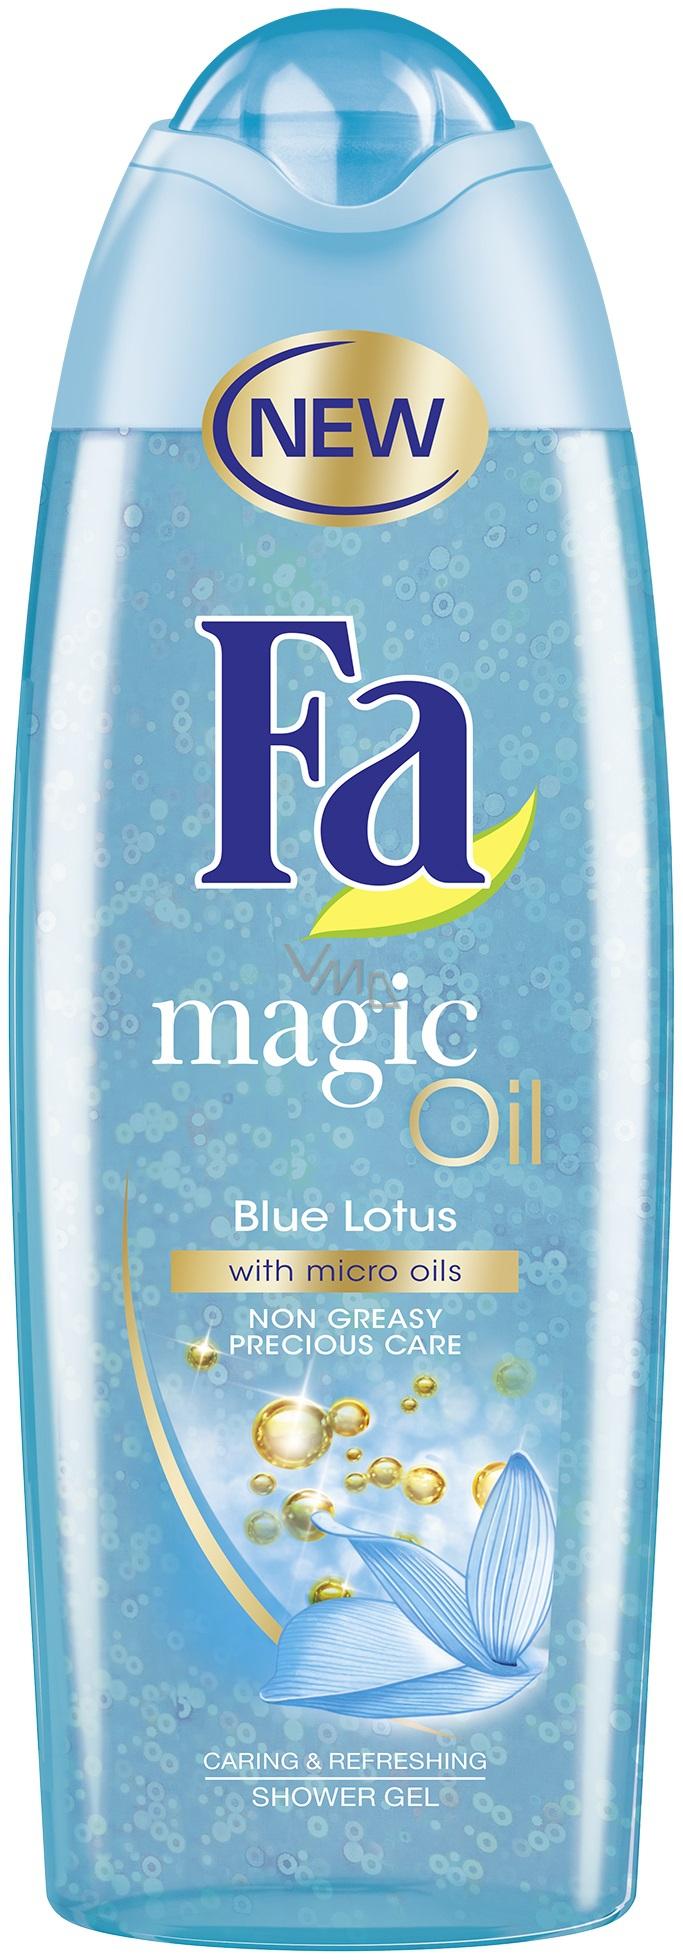 Fa Magic Oil Blue Lotus sprchový gel 250 ml